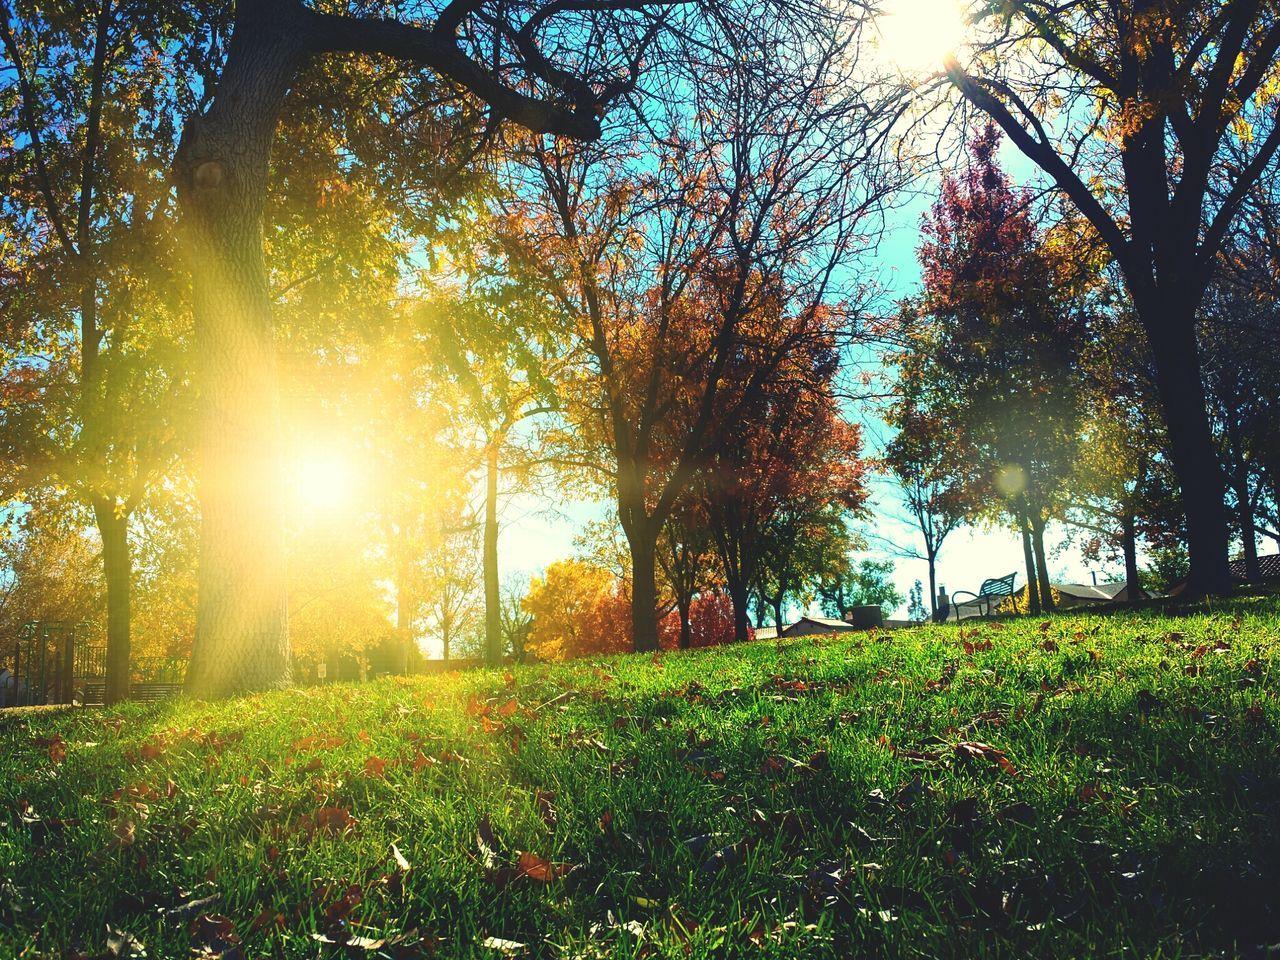 Dani Autumn AMPt_community New Mexico